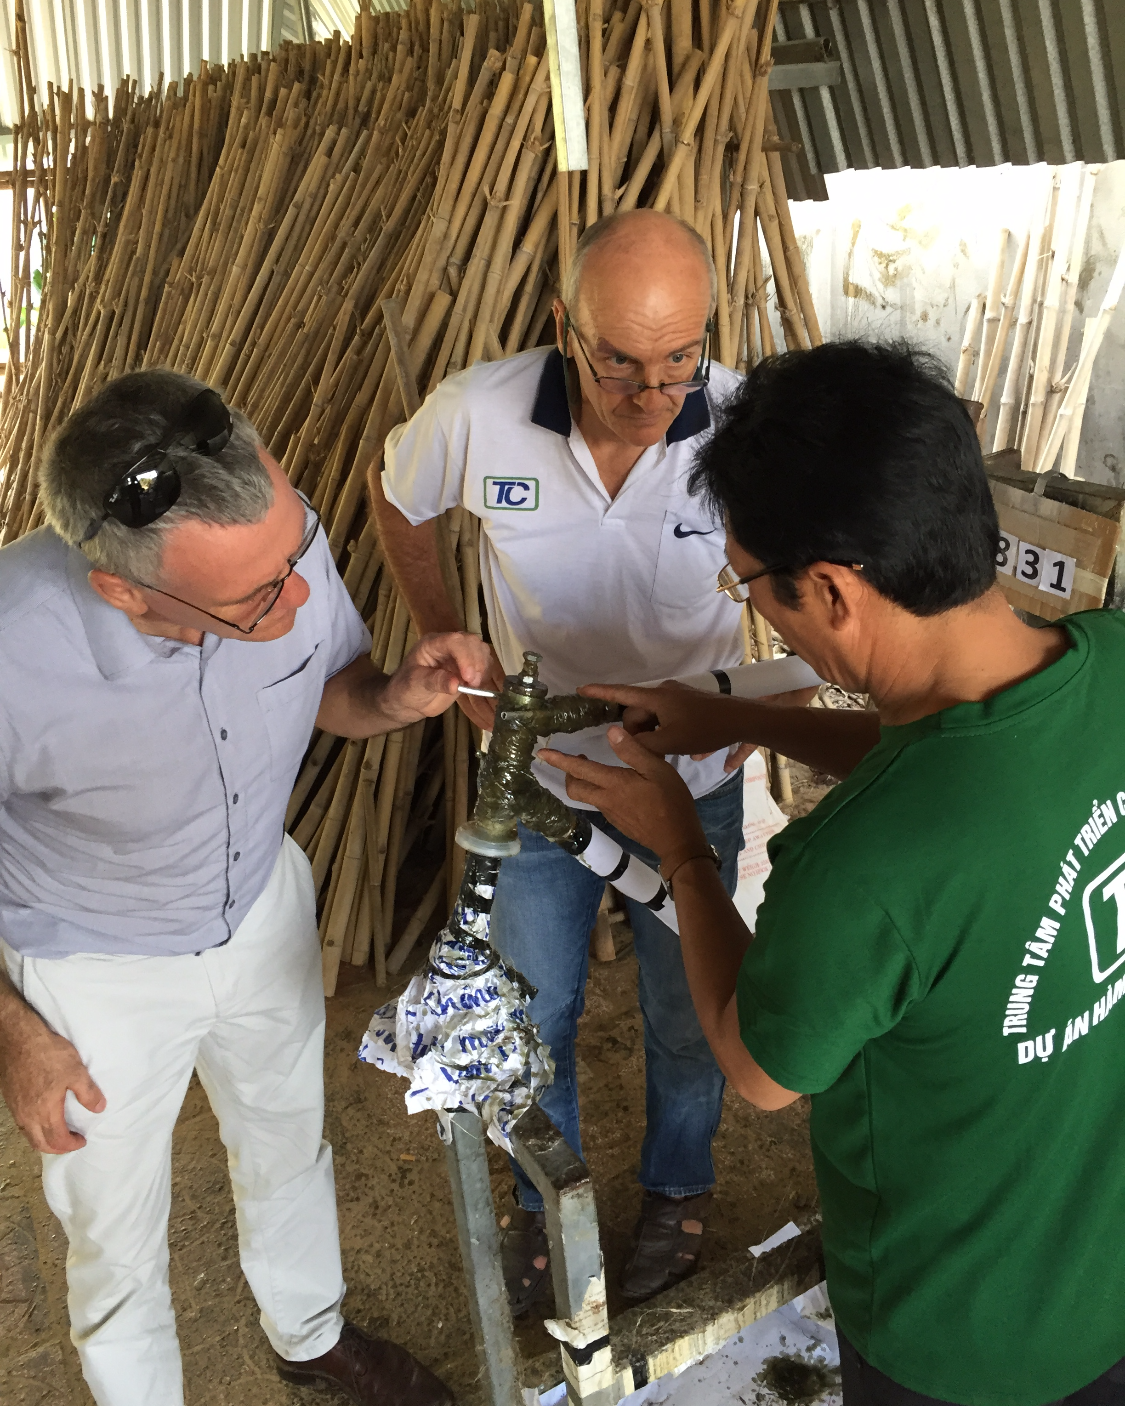 Bamboo bike frame construction